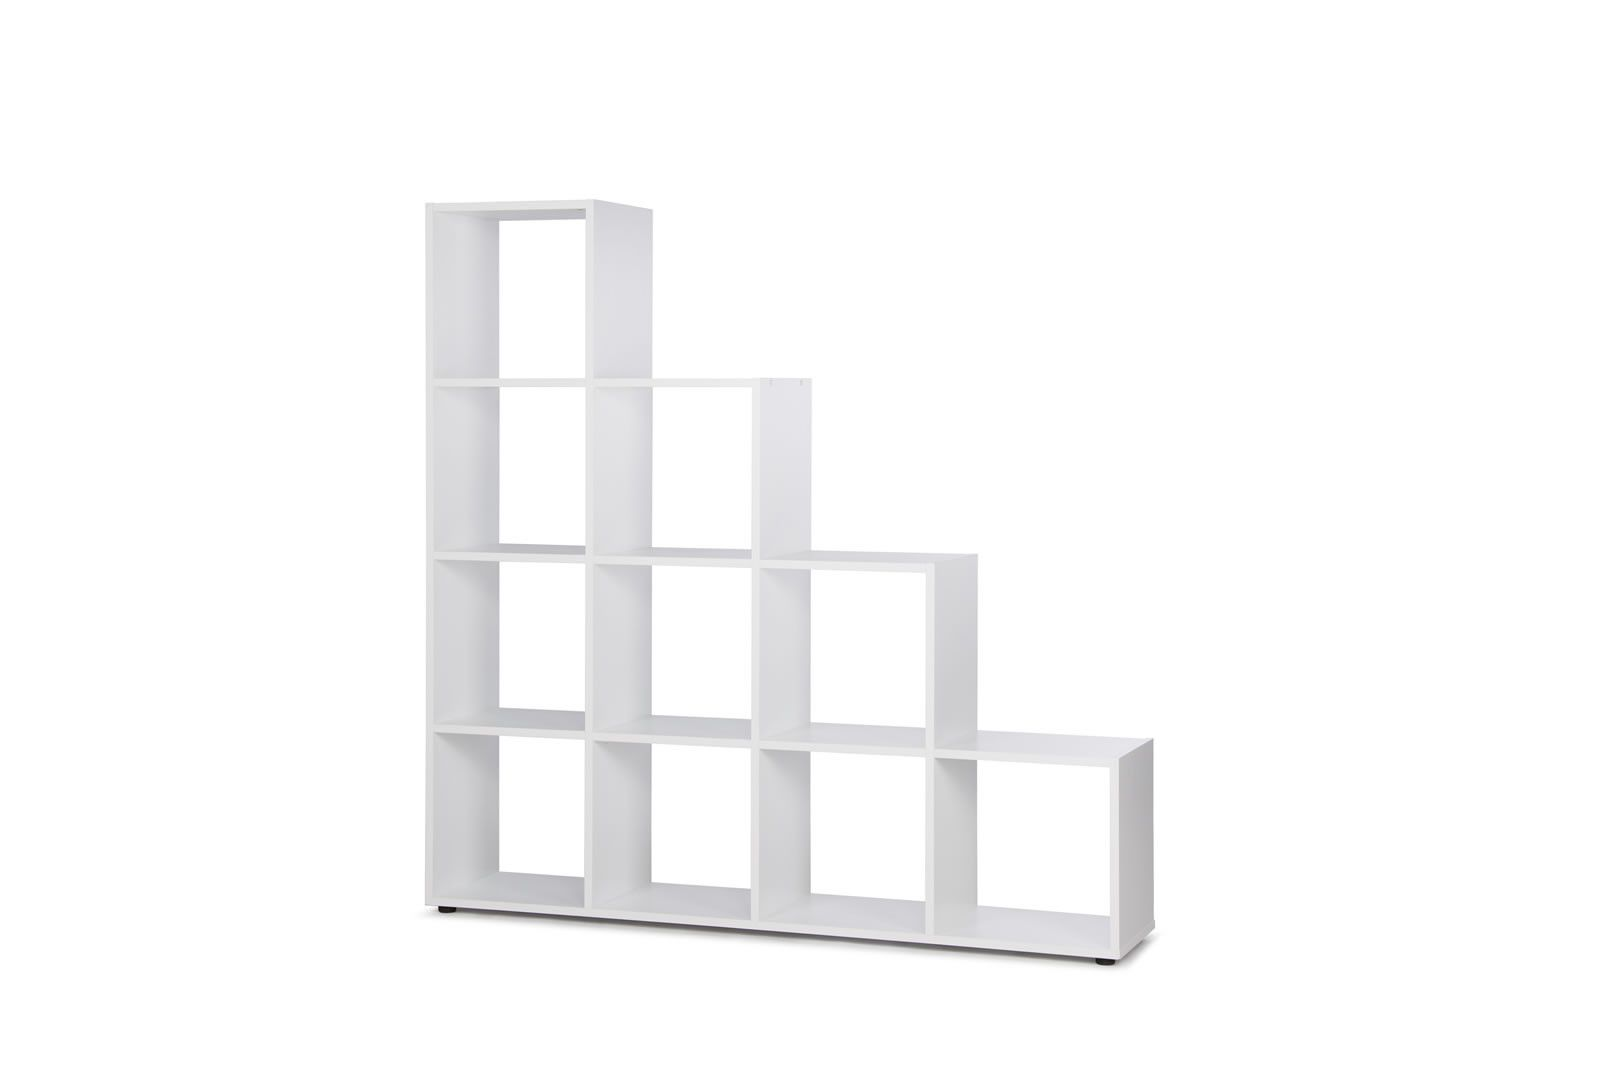 etag res murales etag re murale en escaliers 10 casiers bonkers blanc trocity. Black Bedroom Furniture Sets. Home Design Ideas